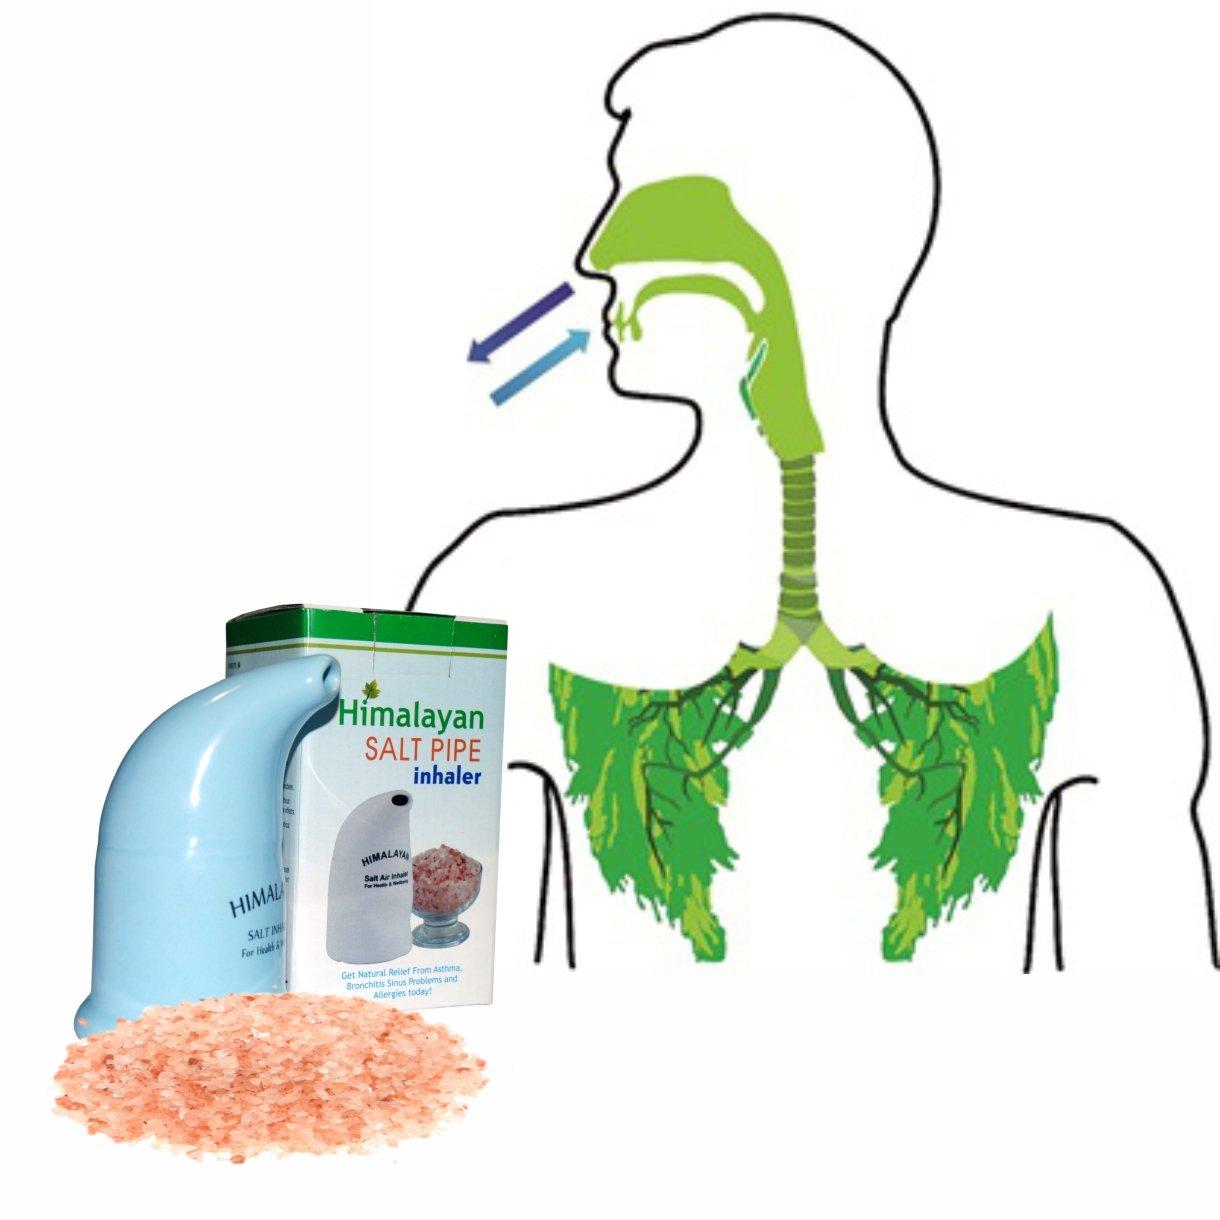 100% Organic Natural Ceramic Salt Inhaler & Pink Himalayan Salt 200grm Salt Free Thai Mad